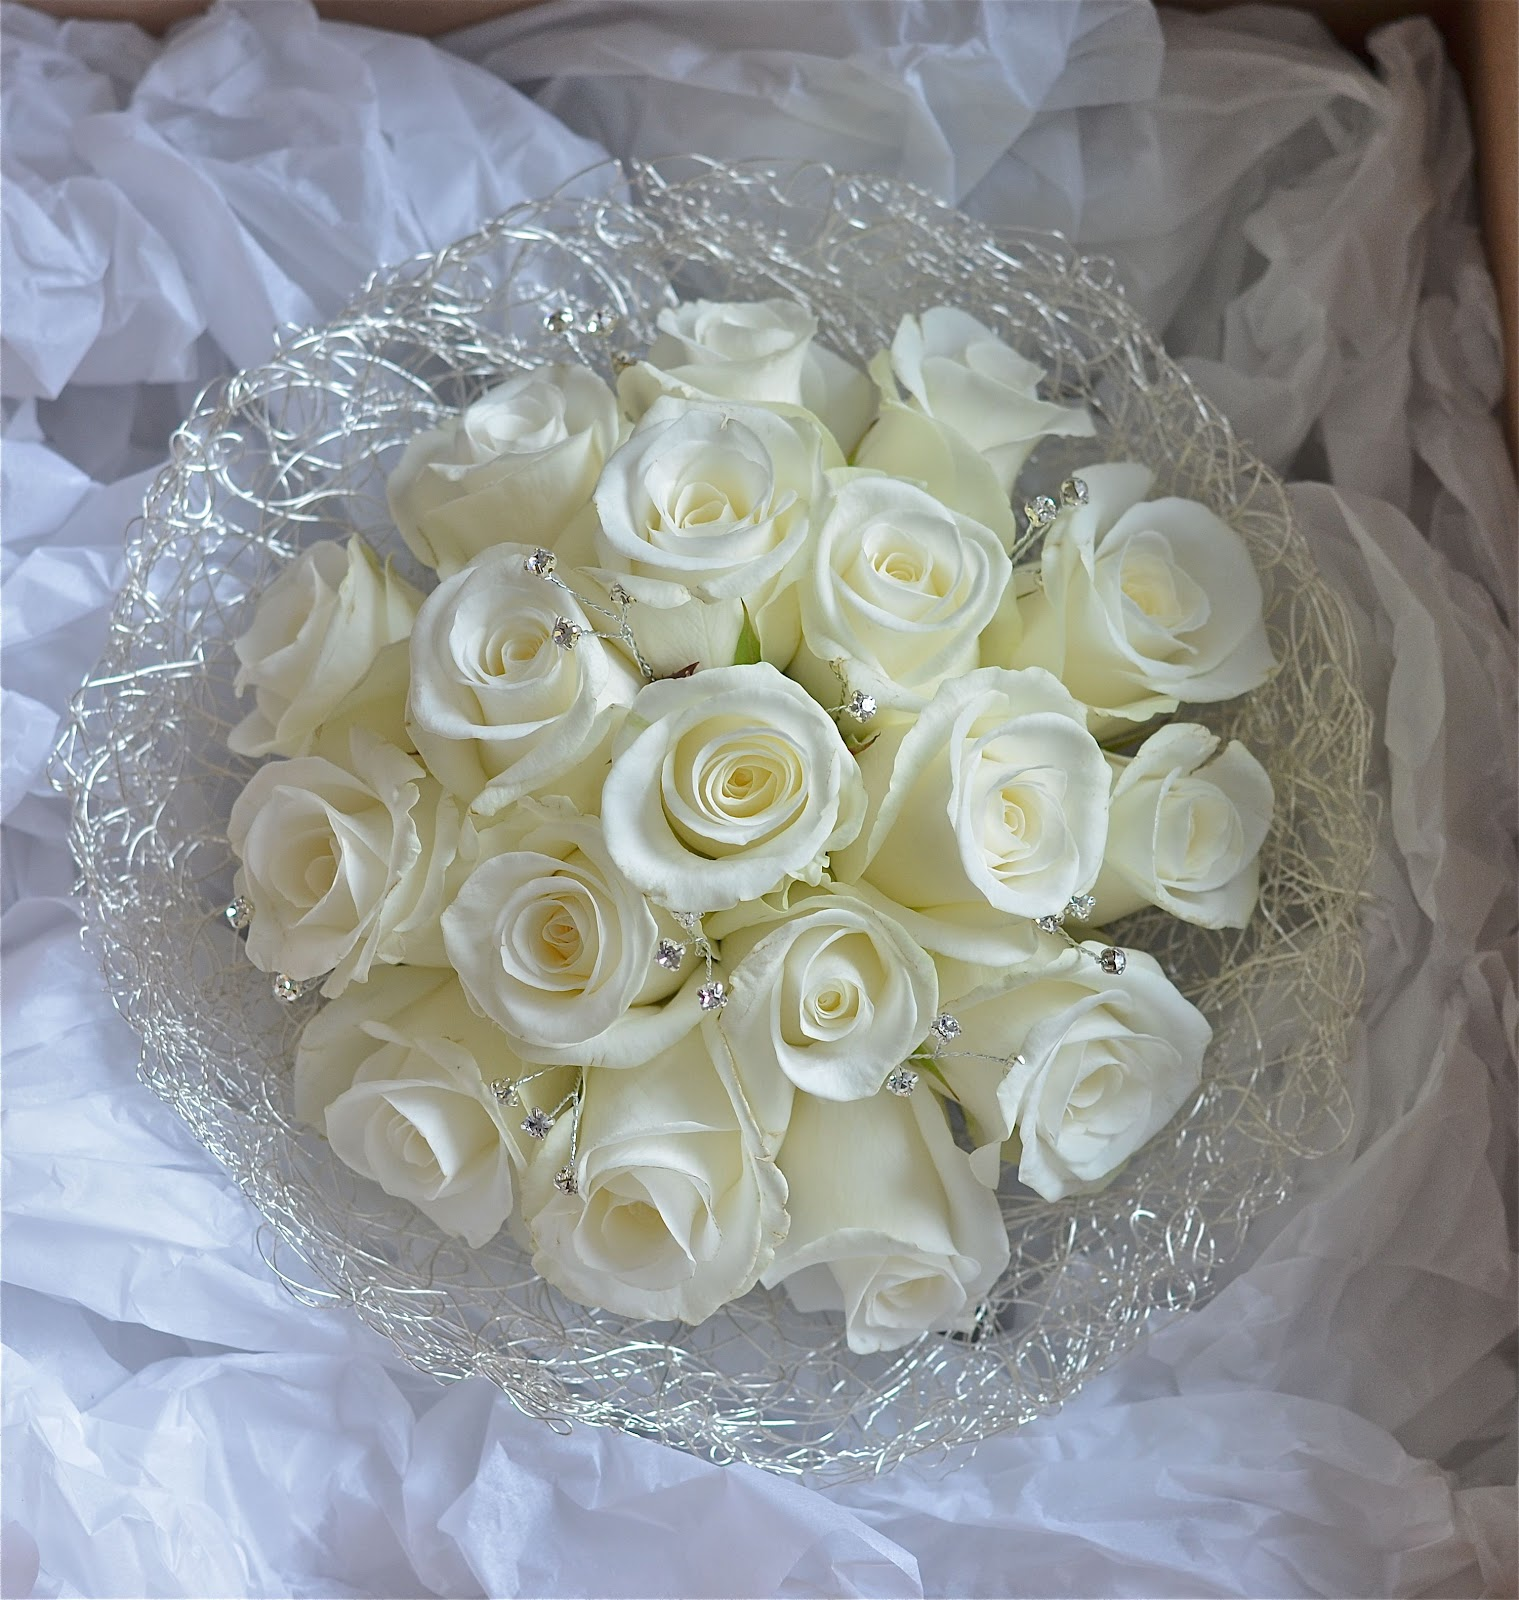 Wedding Flowers In May: Wedding Flowers Blog: May 2012